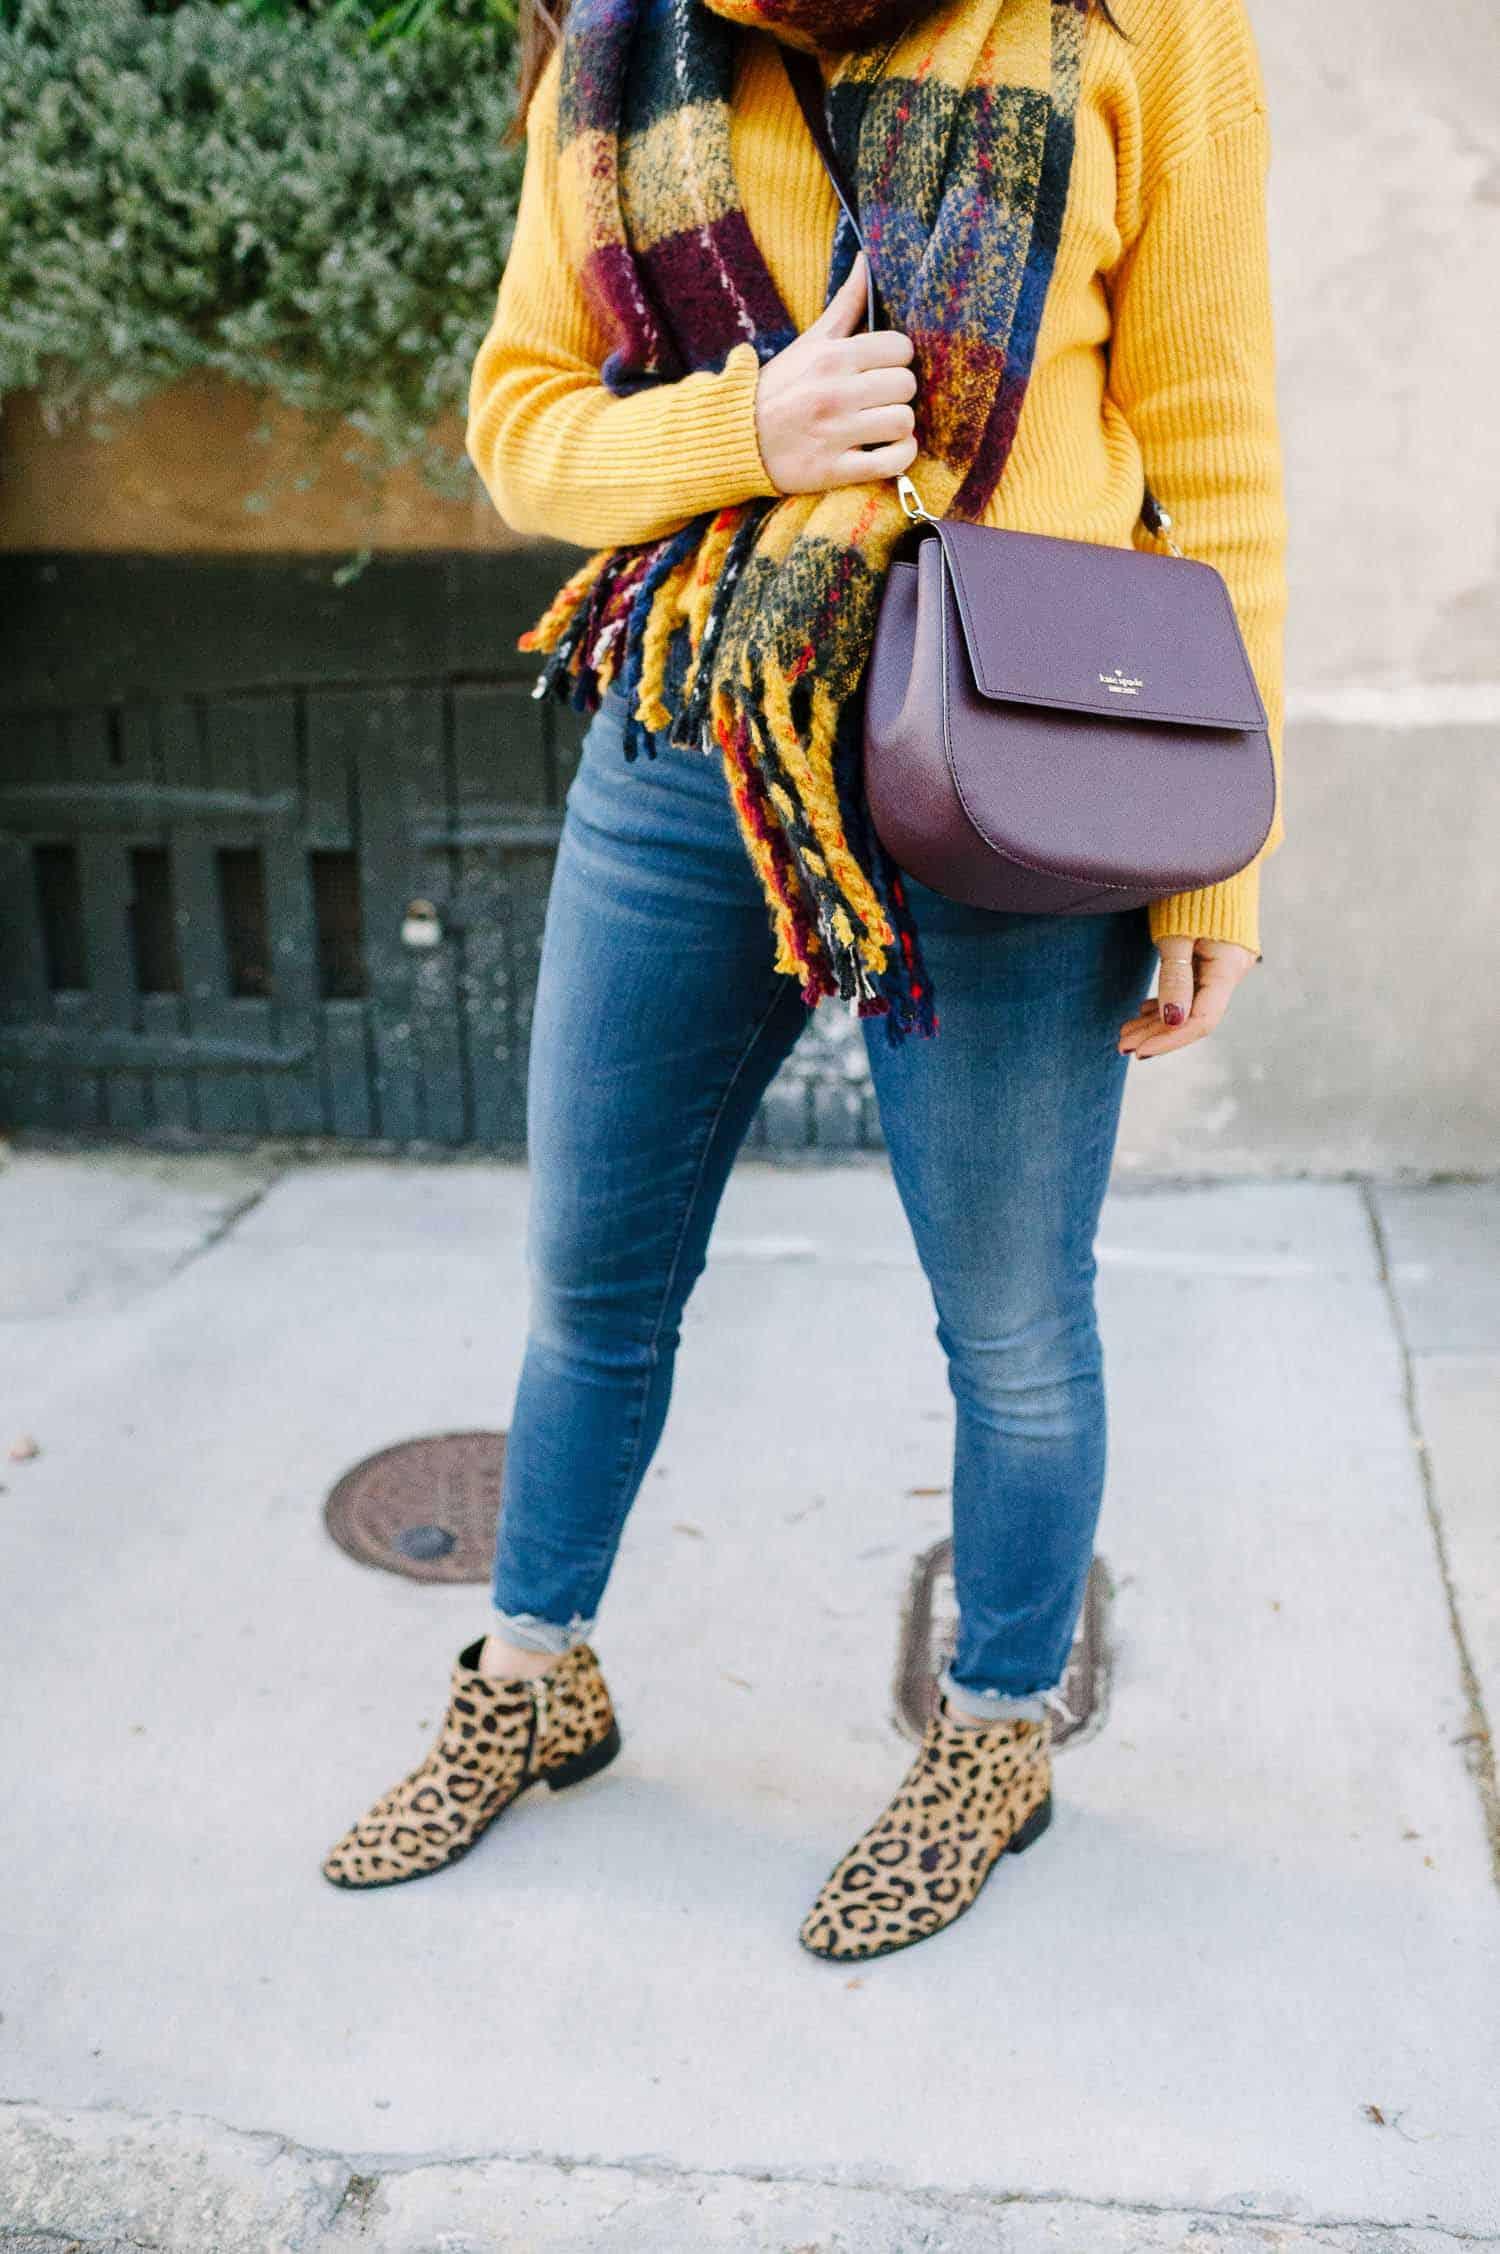 Nordstrom Sweater • Jeans • Leopard Booties • Aldo Scarf c/o • Kat Spade Bag